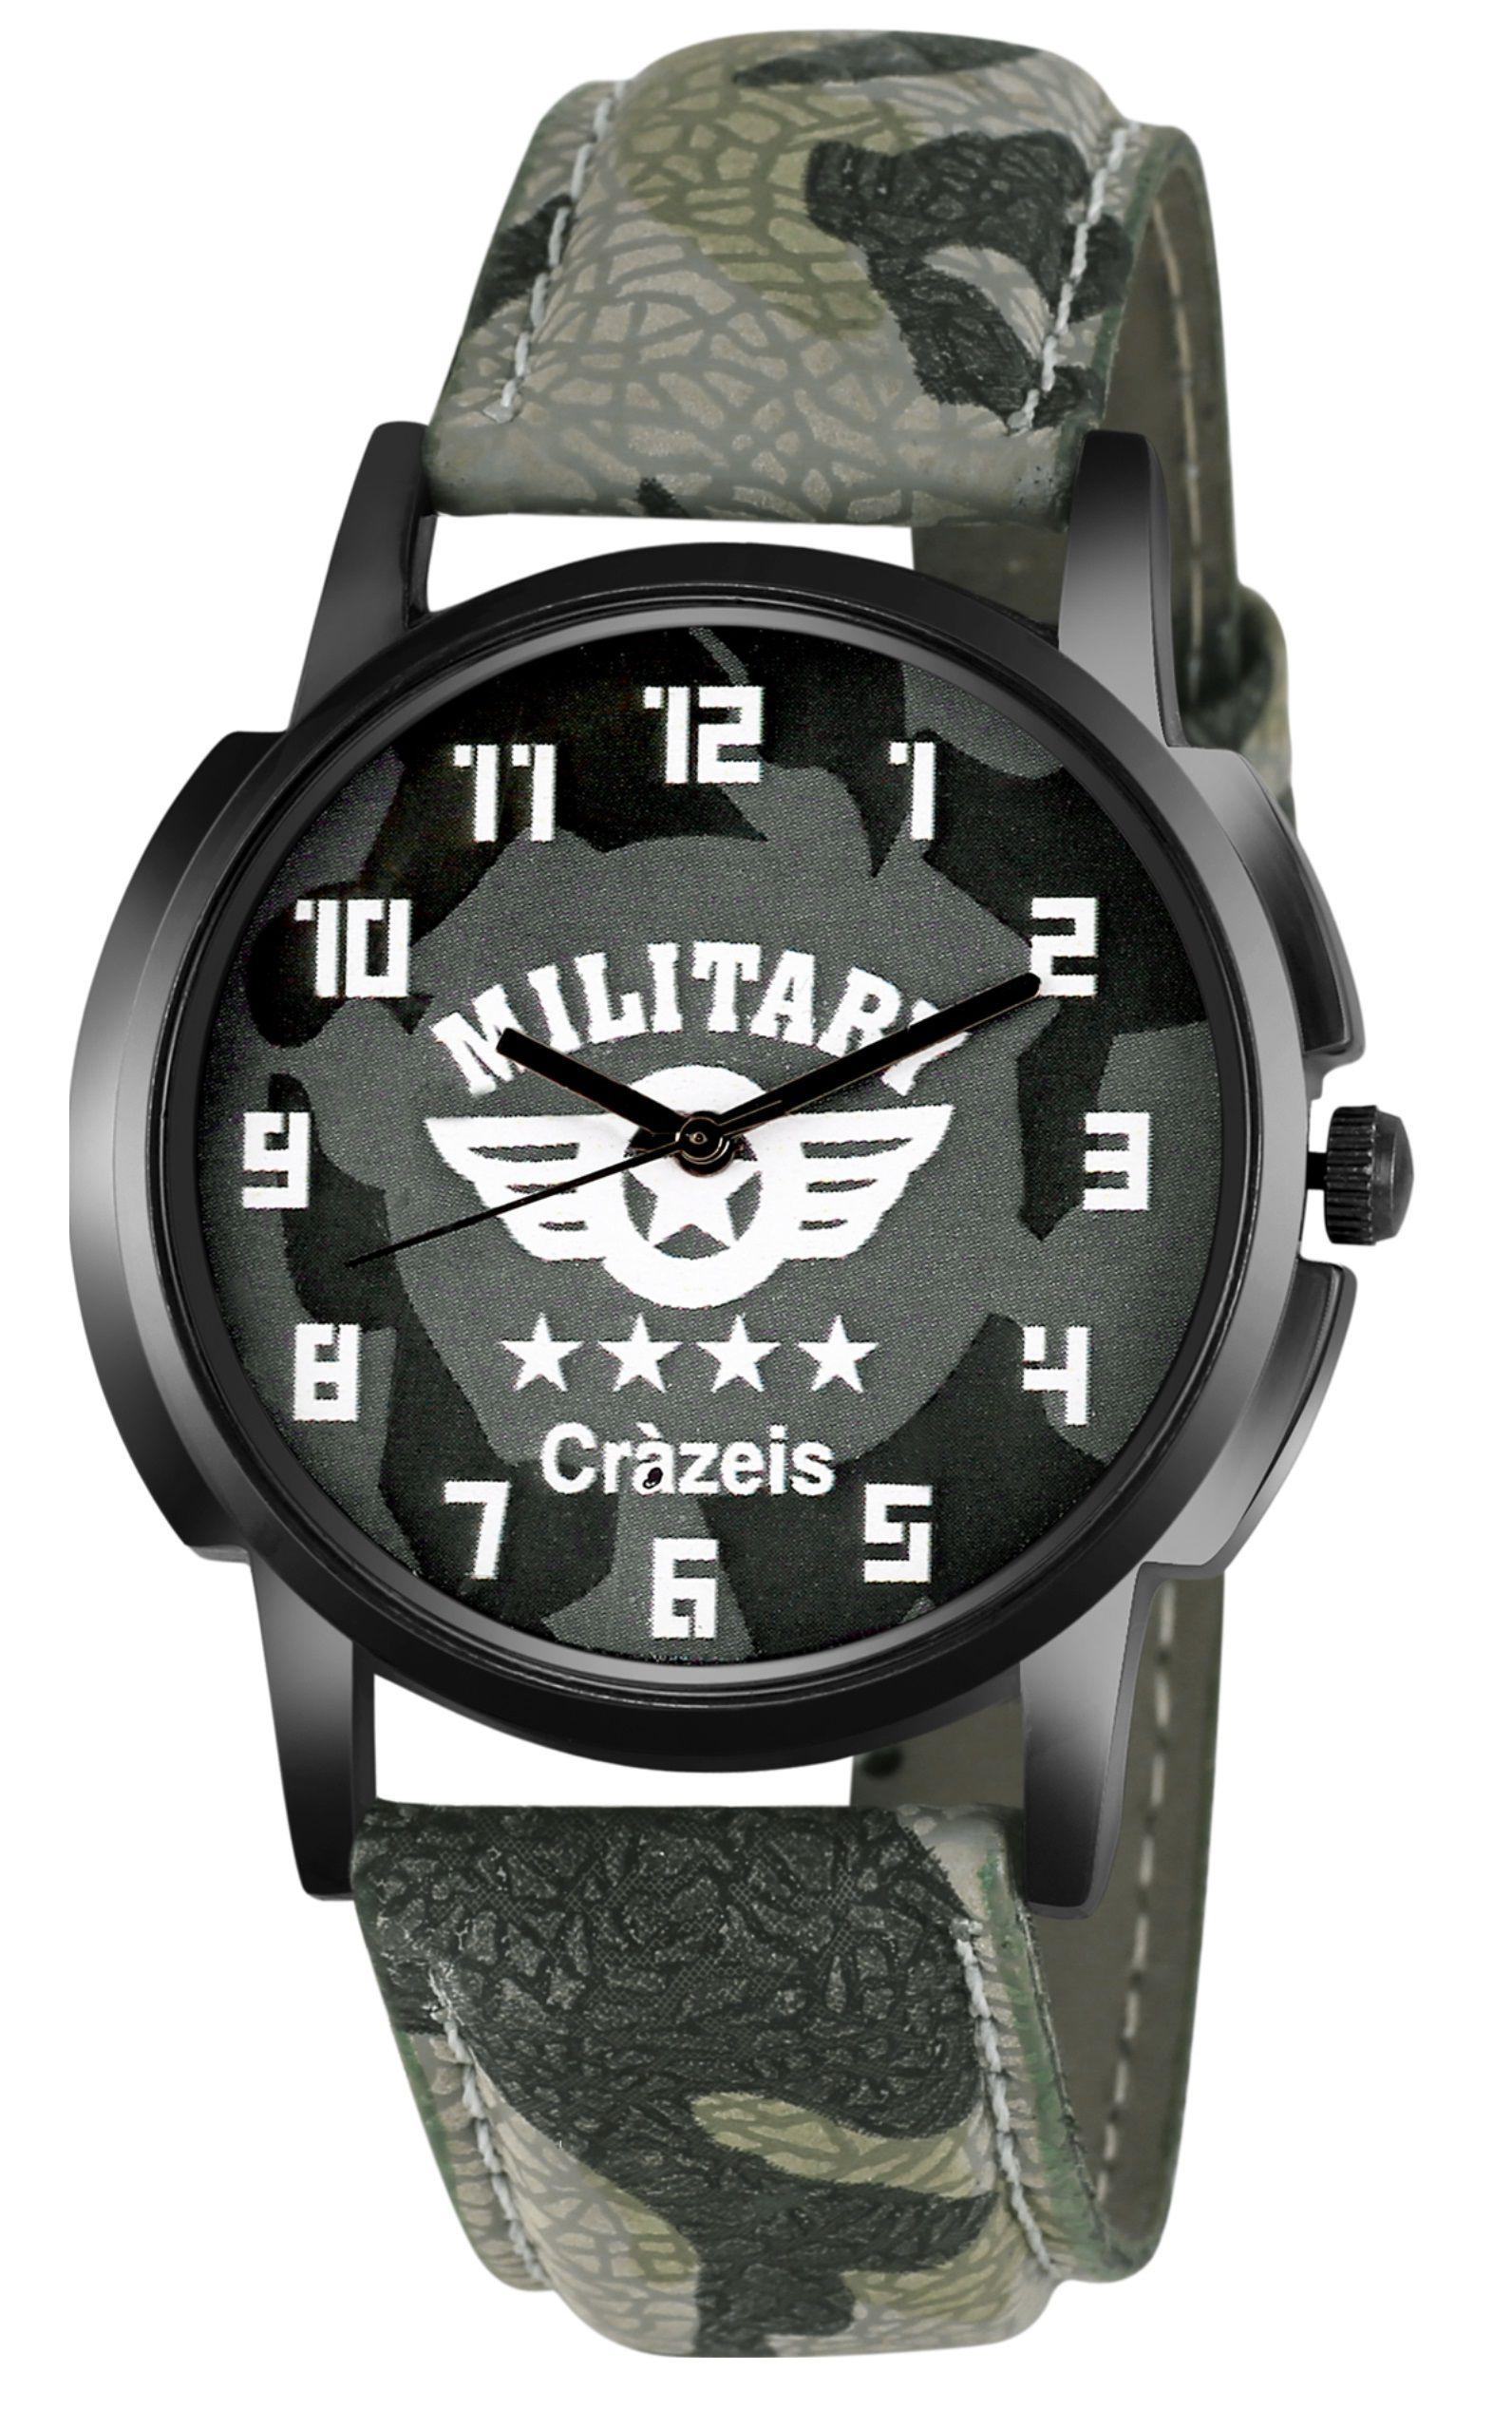 Wrist watch on discount - Crazeis Multicolour Analog Wrist Watch